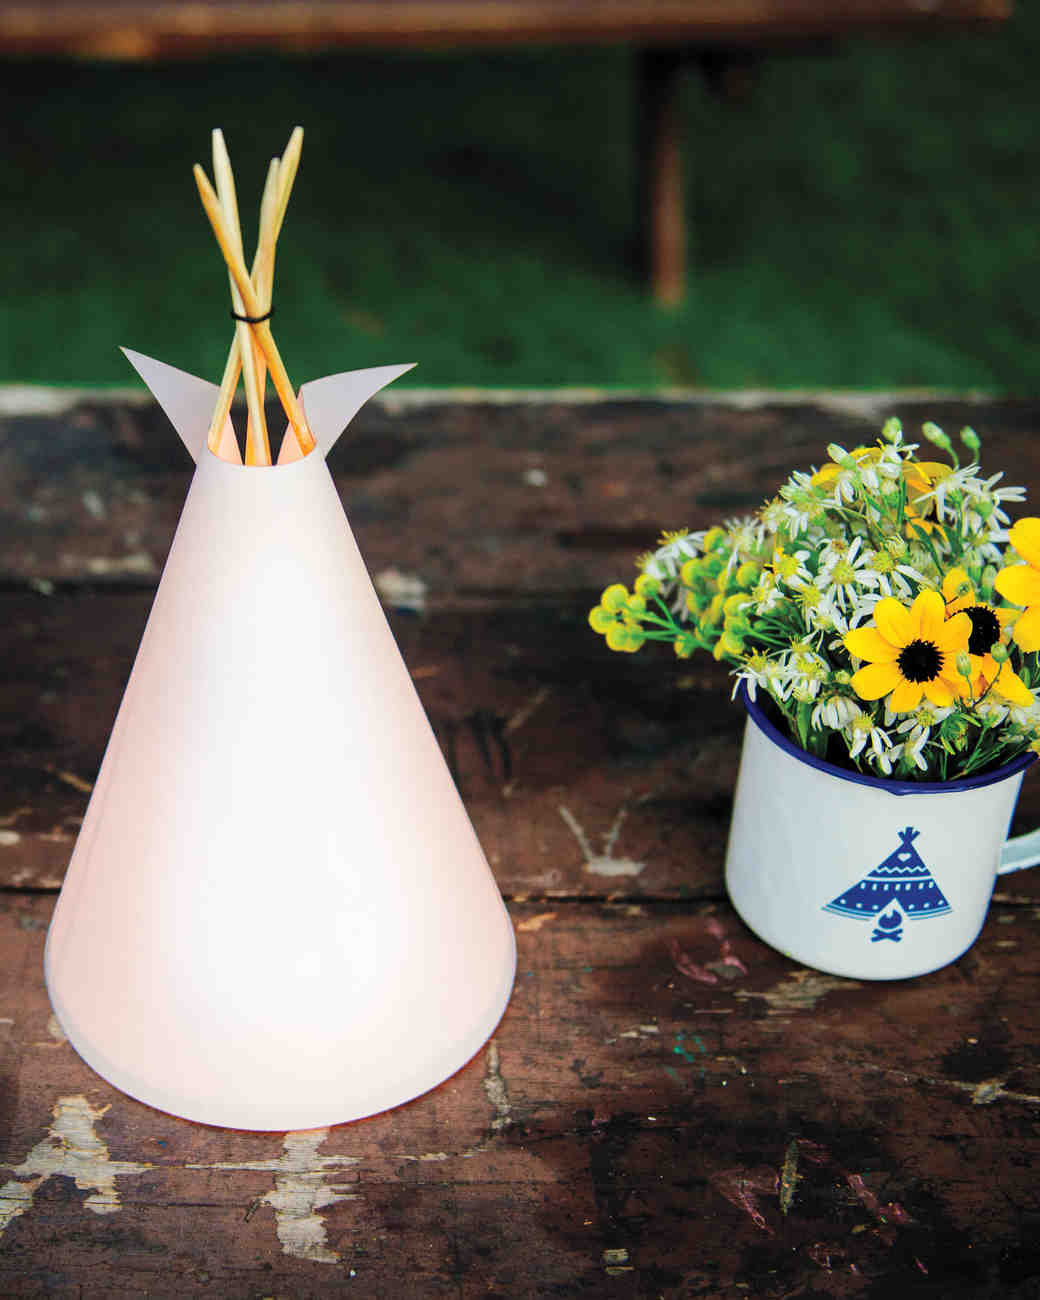 teresa-pepin-tp-57-flower-teepee-s111105.jpg